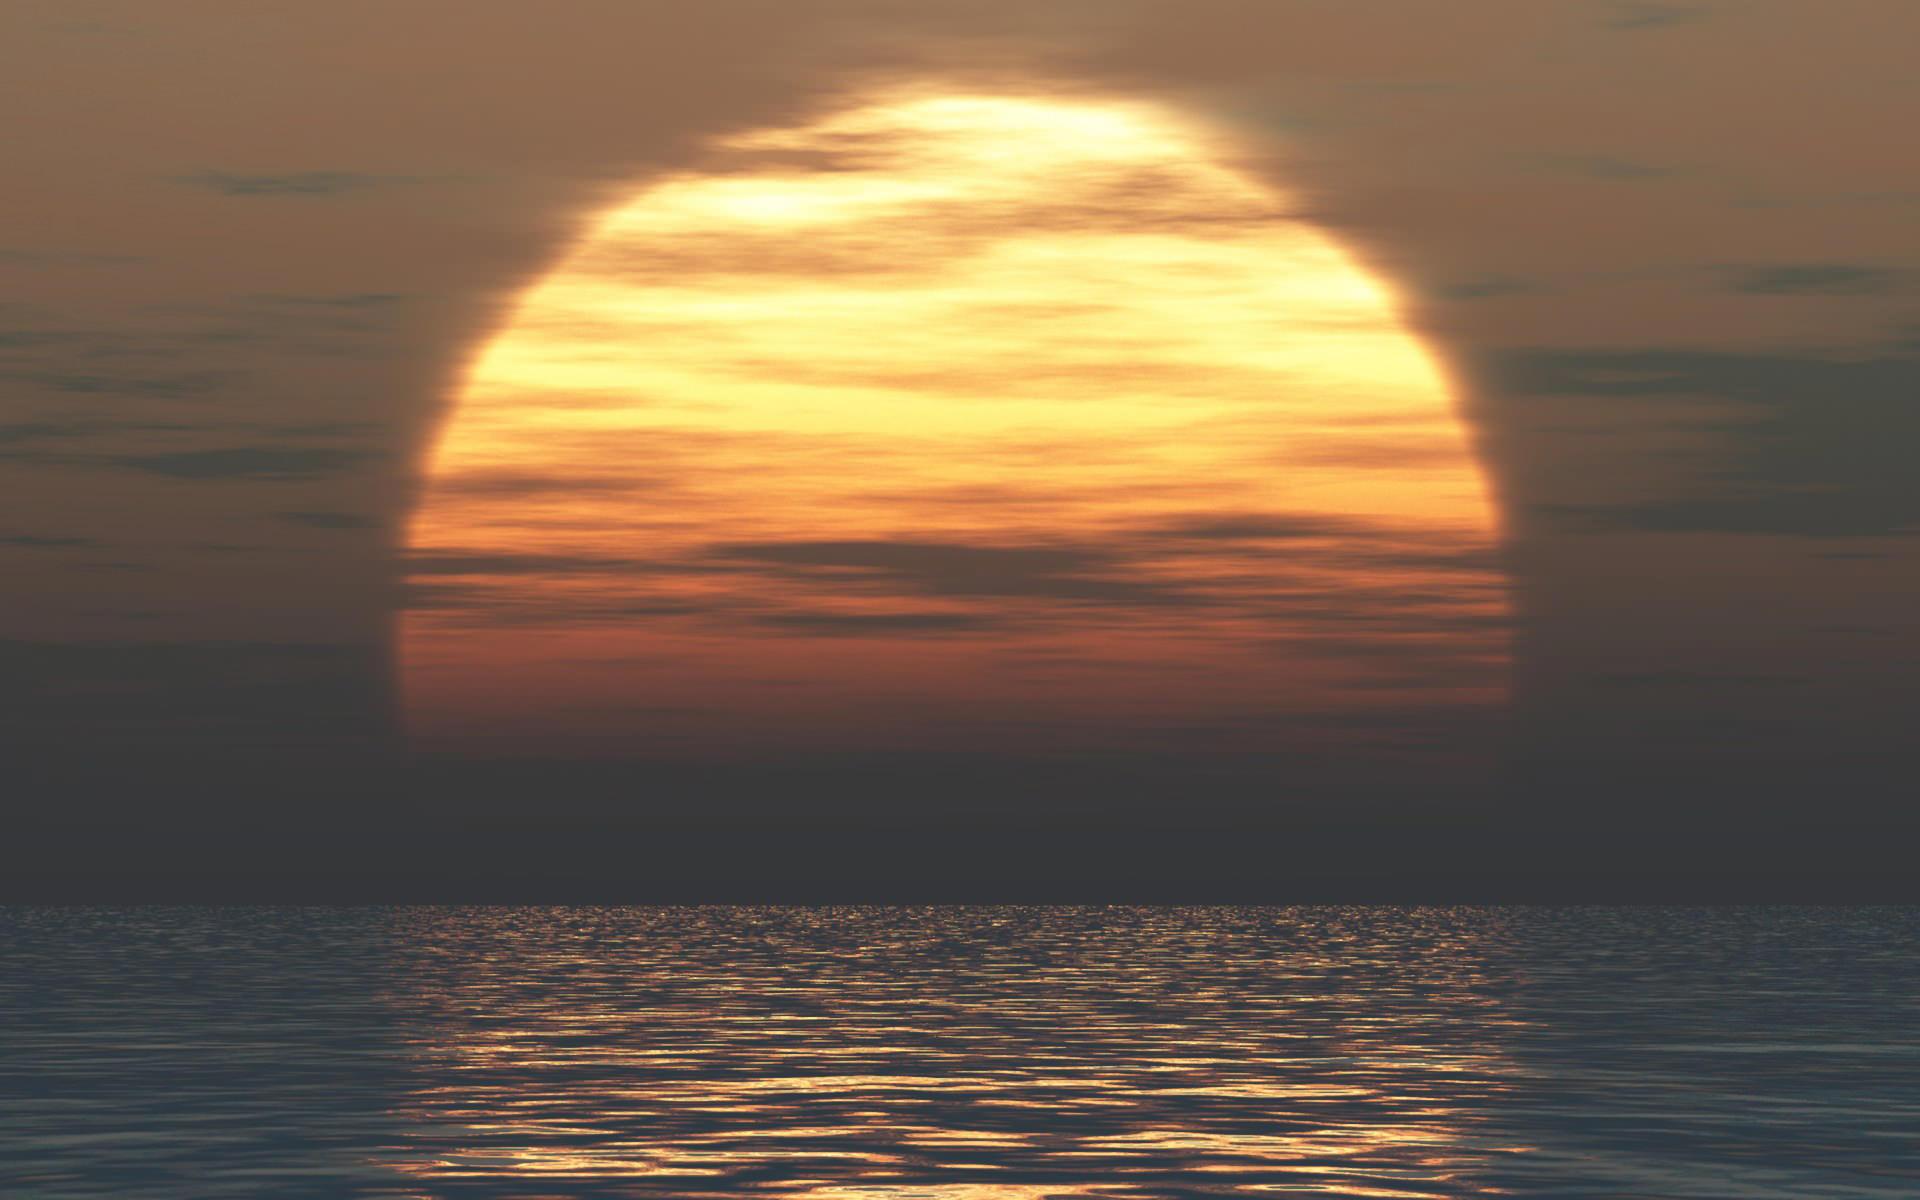 Sunset Background wallpaper - 69868